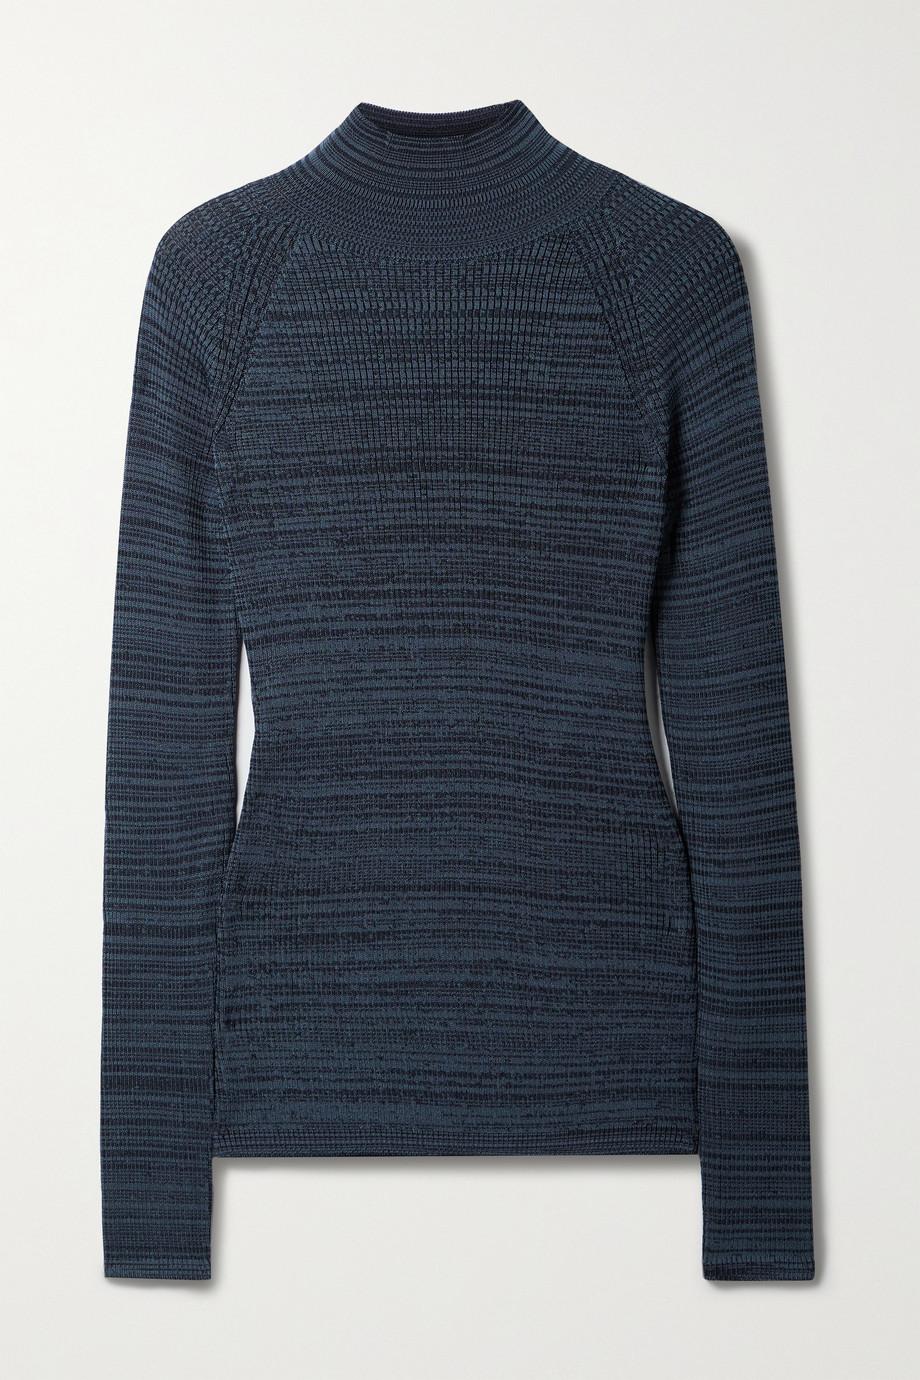 LOW CLASSIC Jacquard-knit turtleneck sweater